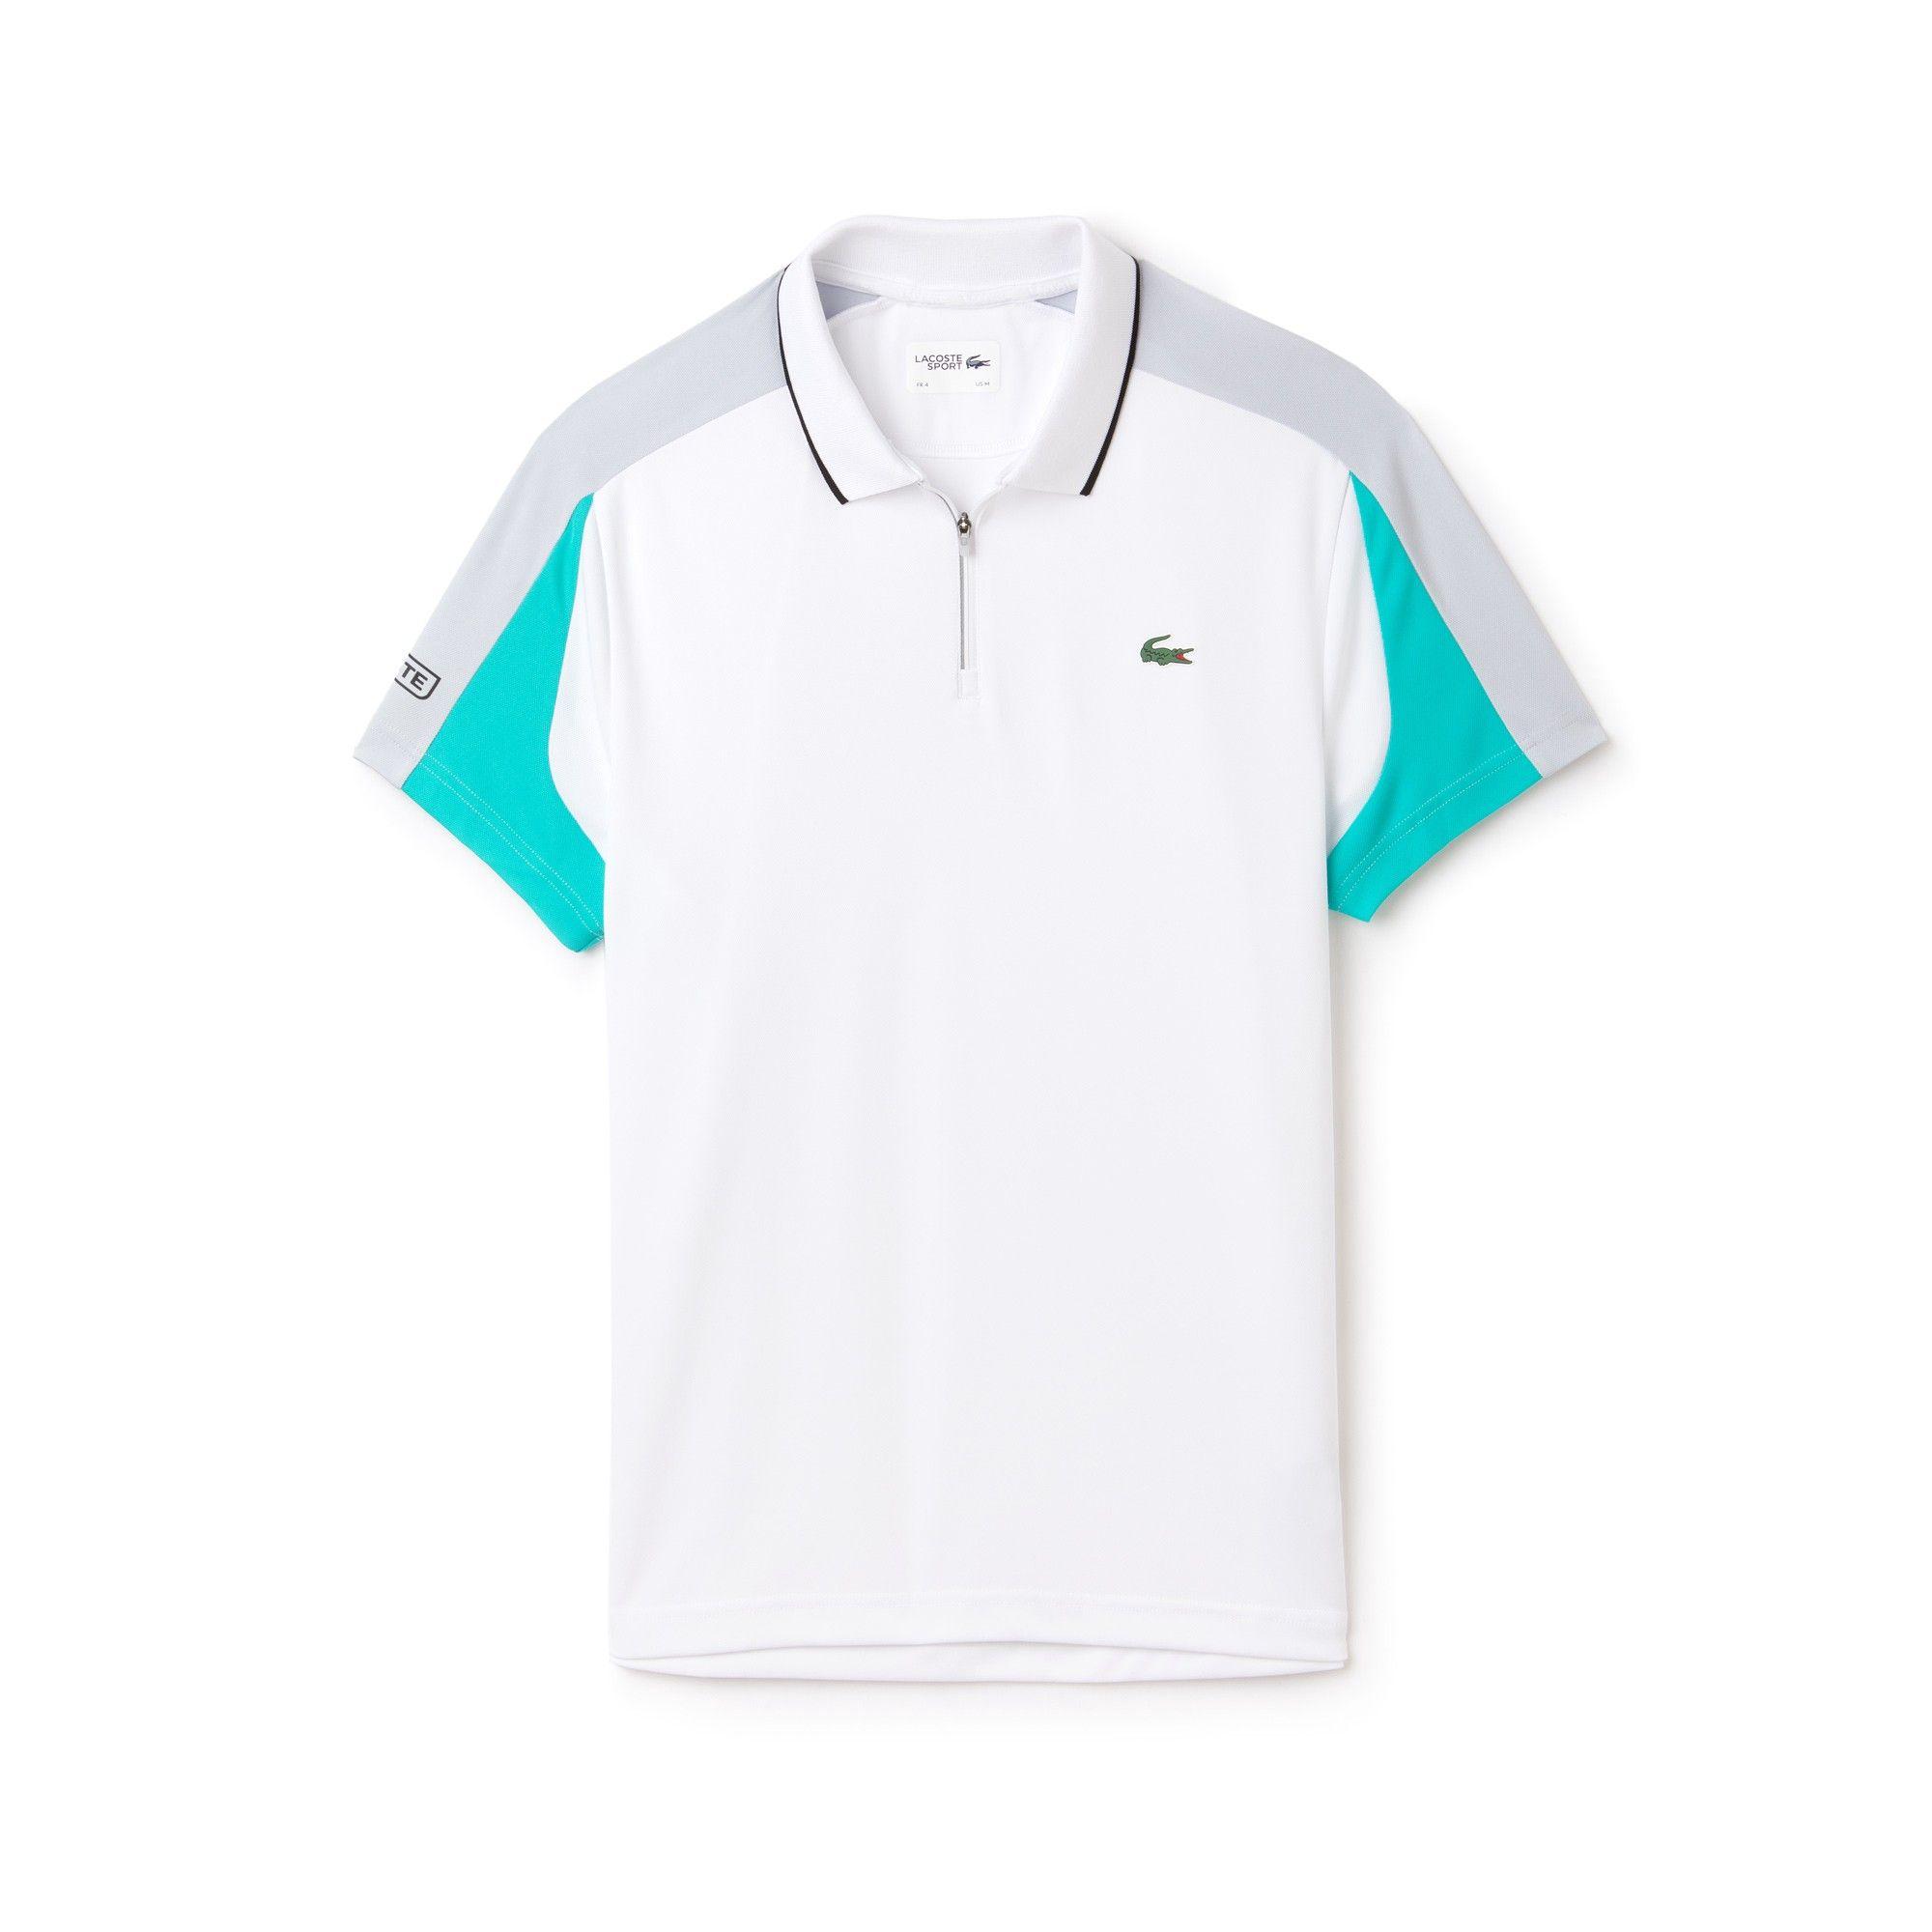 b509199e9cd8ae Lacoste Men s Sport Zip Neck Contrast Bands Piqué Tennis Polo - Lighthouse  Red Navy Blue- 4Xl Green